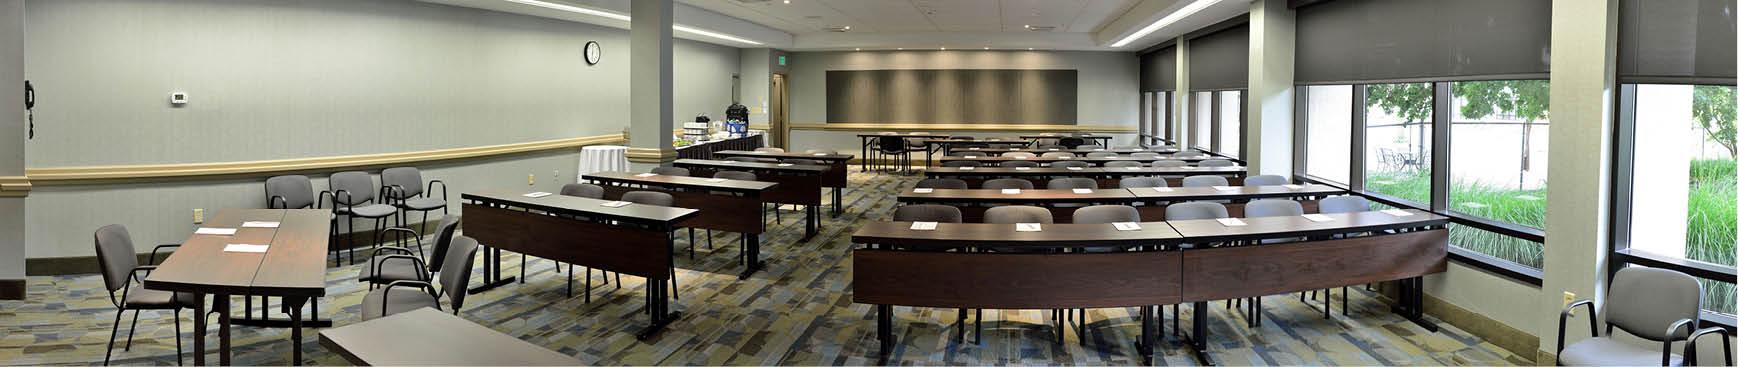 Meetings Conference Rooms of Turf Valley Resort